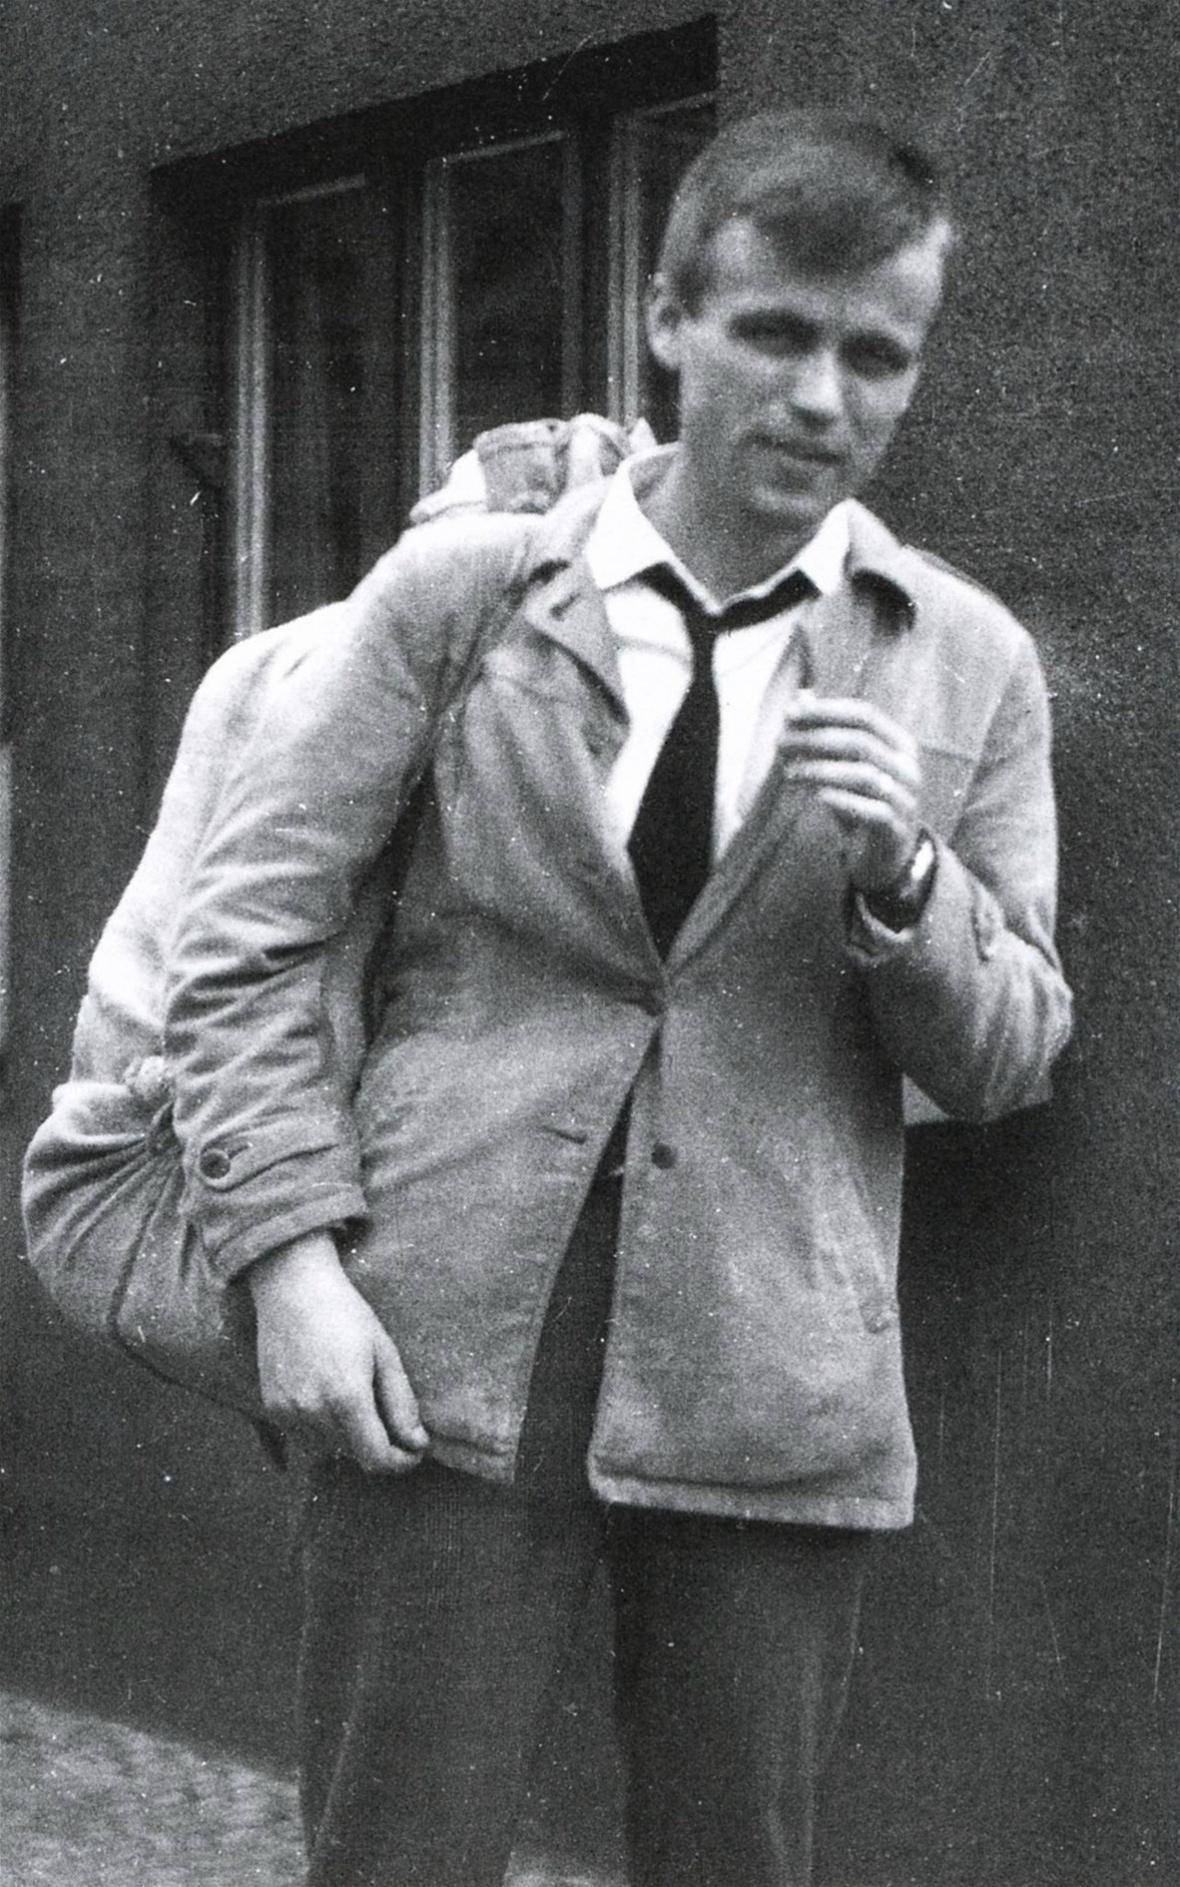 Václav Hrabě při návratu z vojny